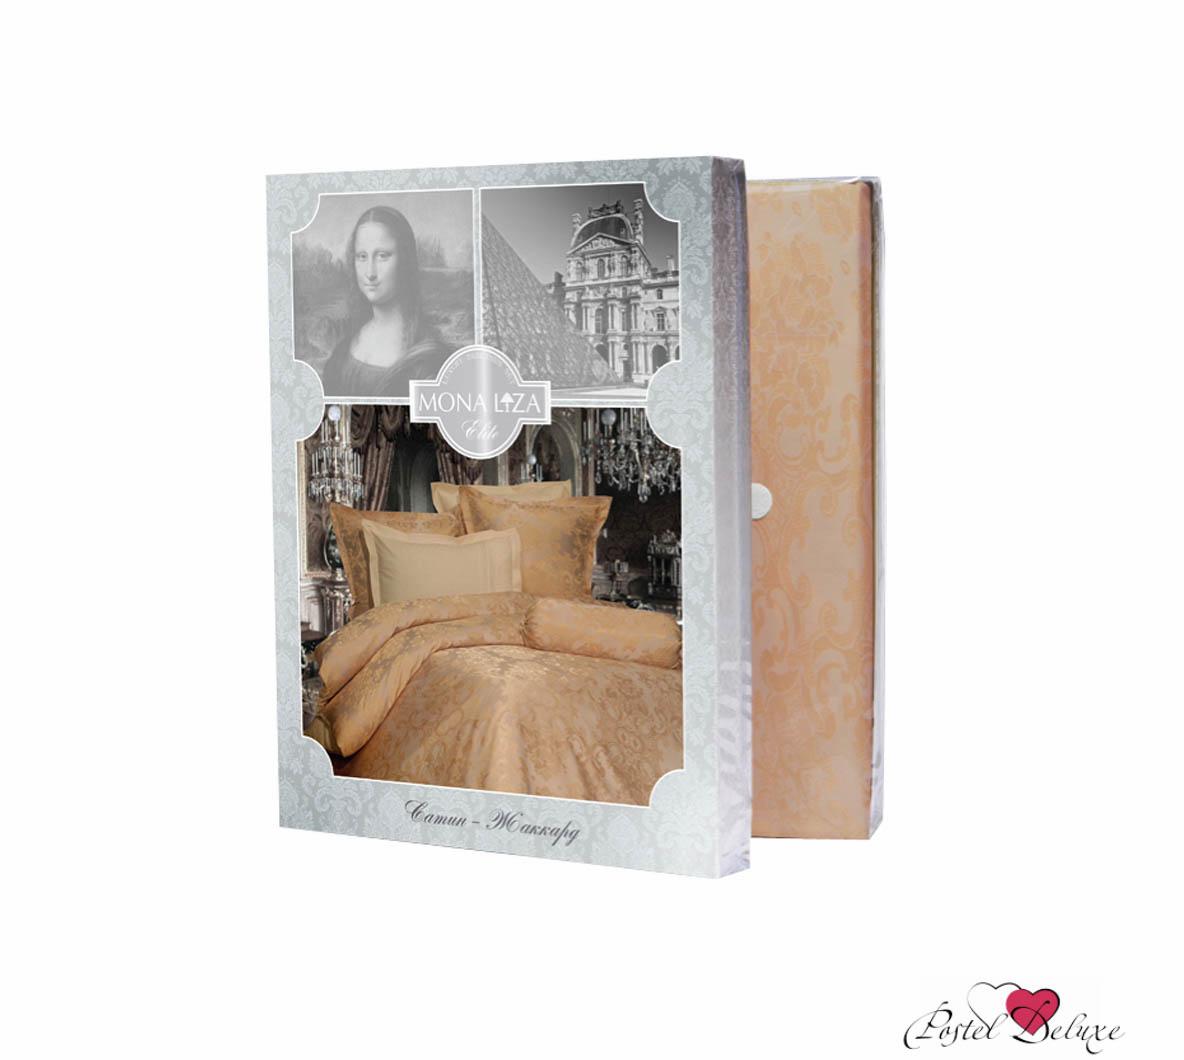 Постельное белье Mona Liza Постельное белье Madam Stuart (2 спал.) комплект пб 2 сп mona liza сатин жаккард royal 4 нав 2шт 70х70 и 2 шт